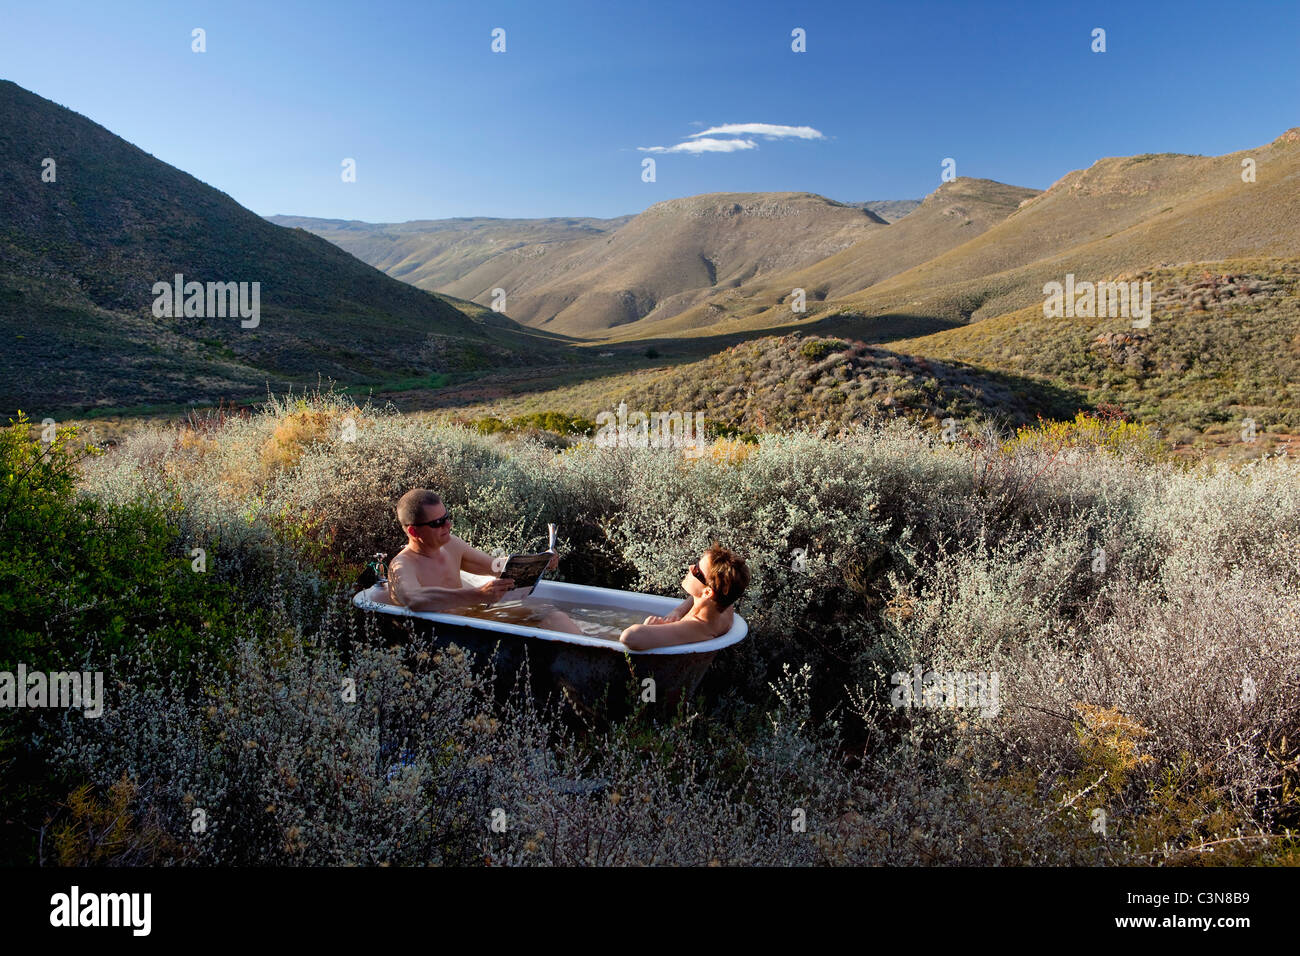 South Africa, Western Cape, Montagu, Simonskloof Mountain Retreat. Couple taking outdoor bath. - Stock Image